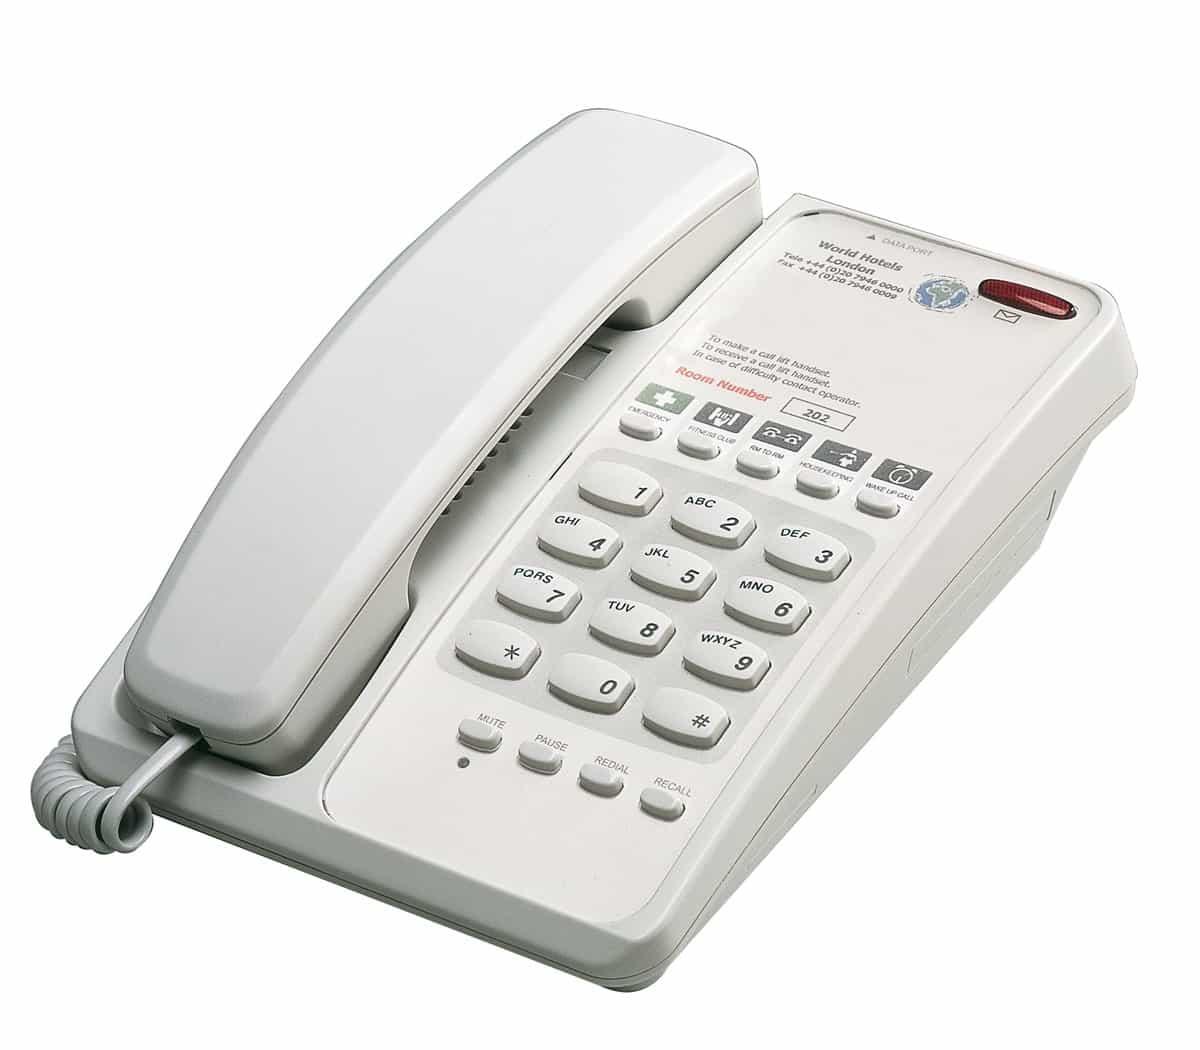 Interquartz Voyager 9281F